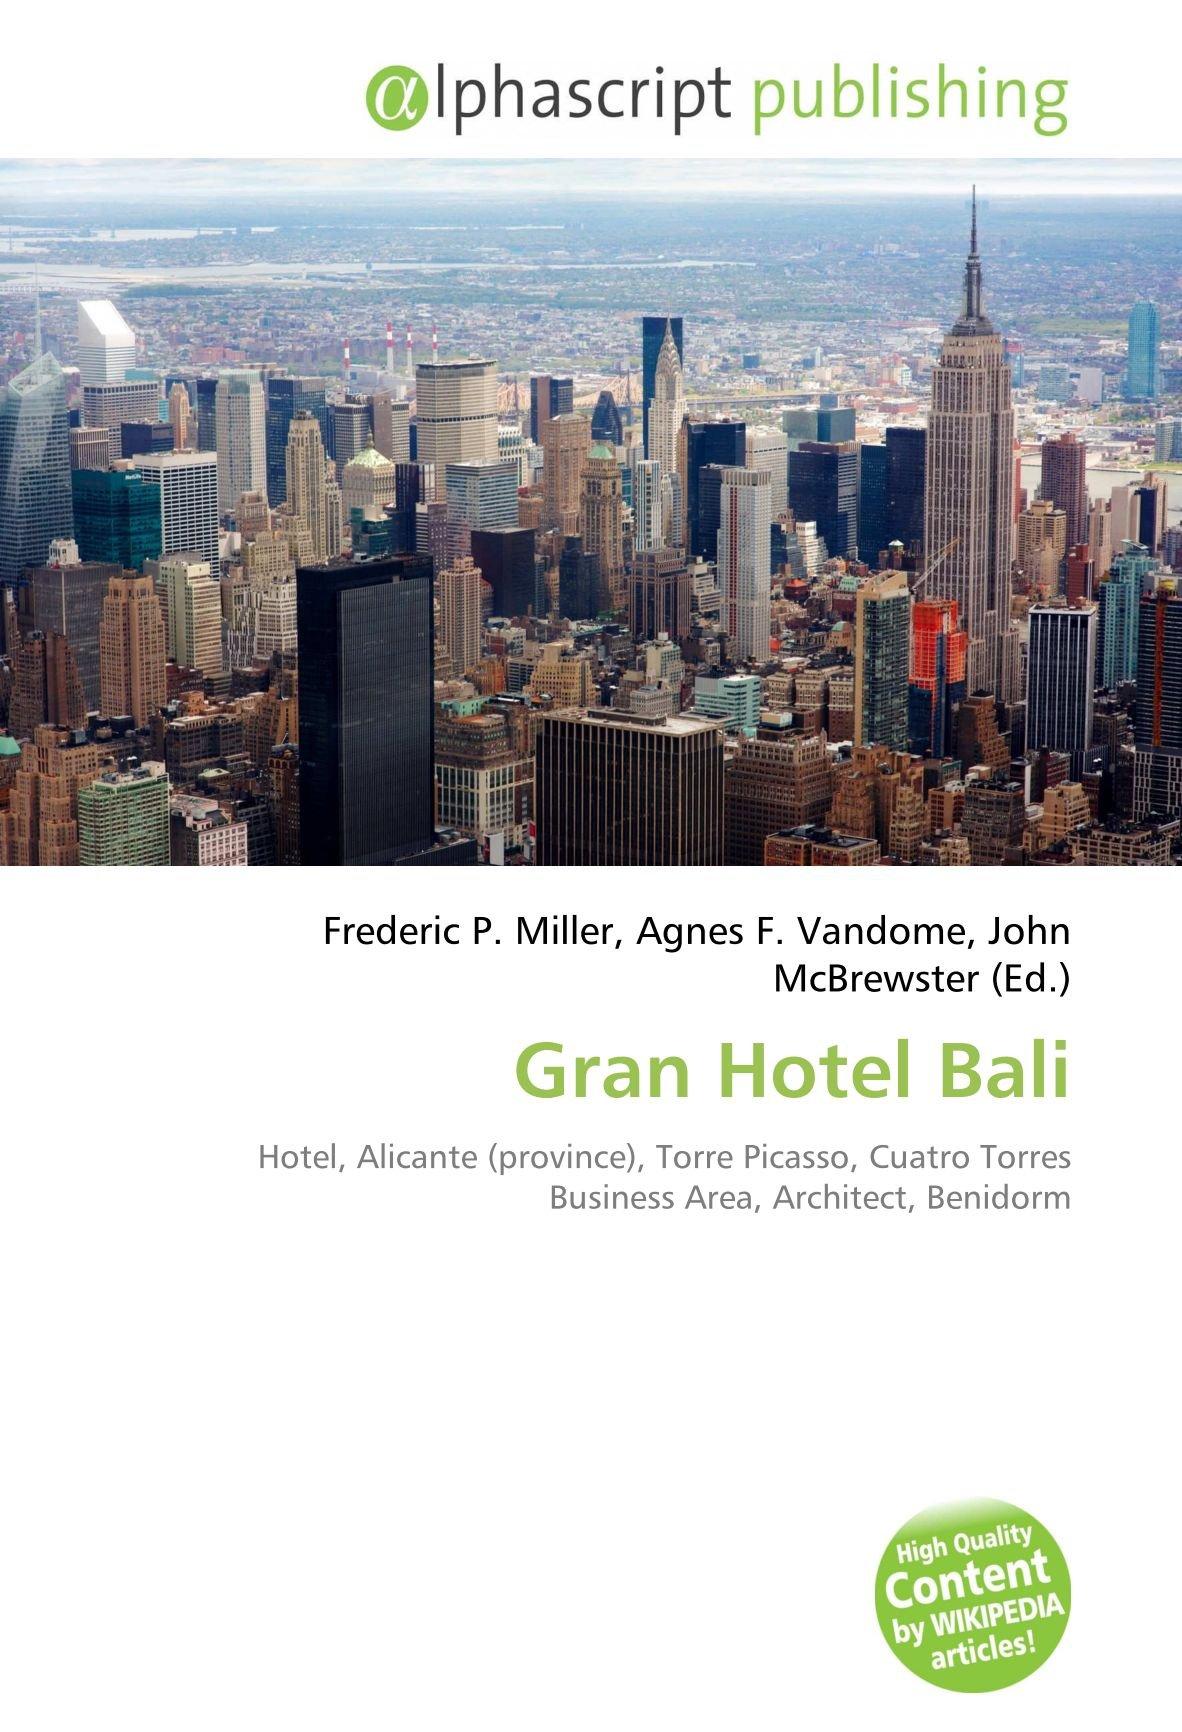 Gran Hotel Bali: Hotel, Alicante province , Torre Picasso, Cuatro Torres Business Area, Architect, Benidorm: Amazon.es: Frederic P Miller, Agnes F Vandome, ...